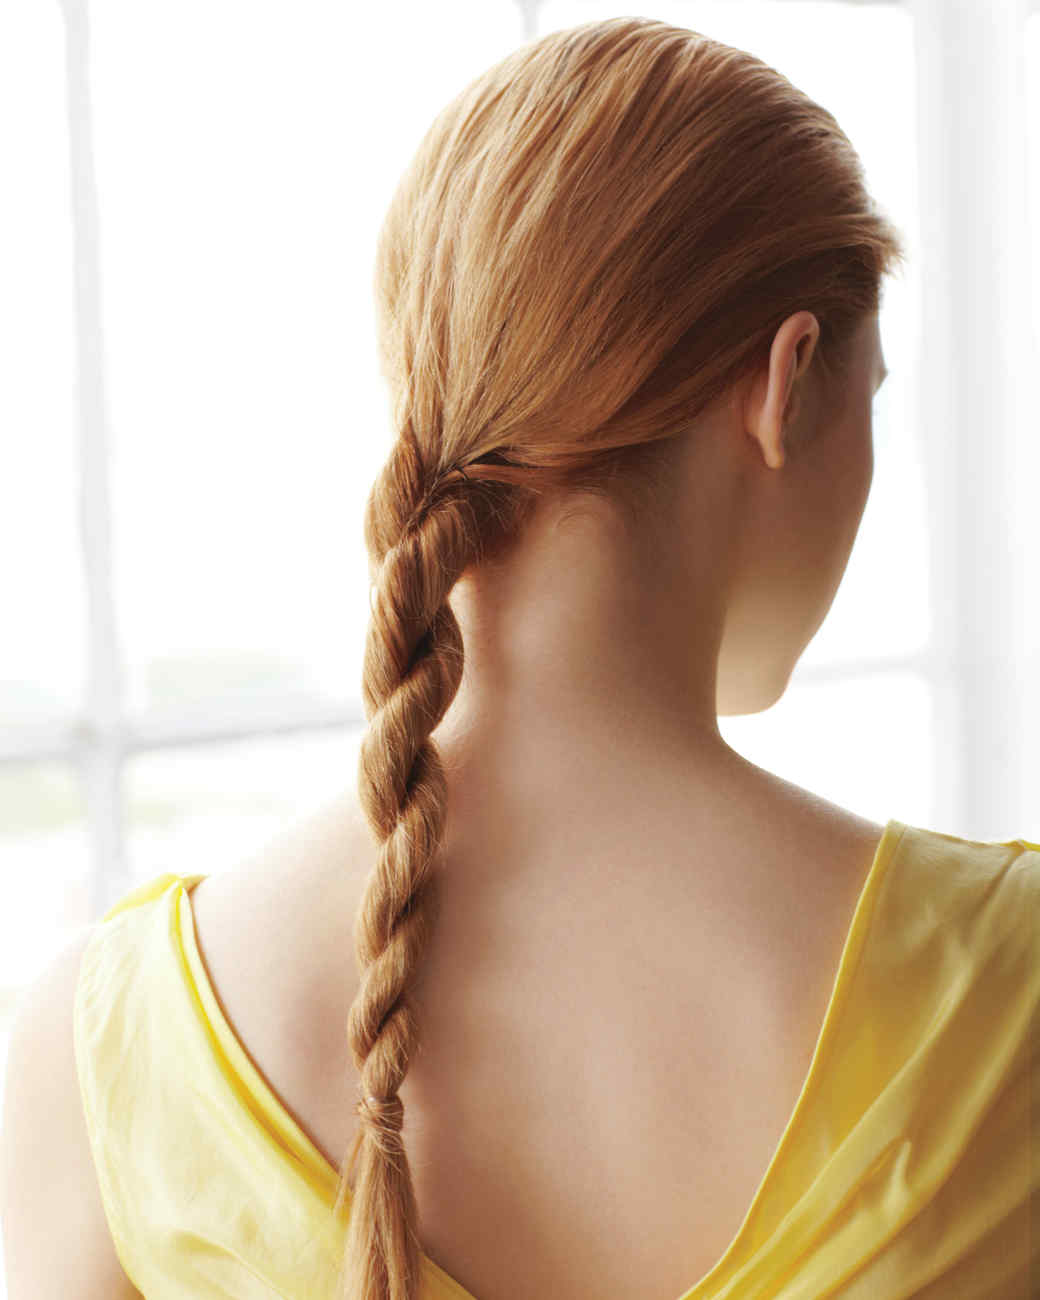 braids-rope-braid-md10882.jpg